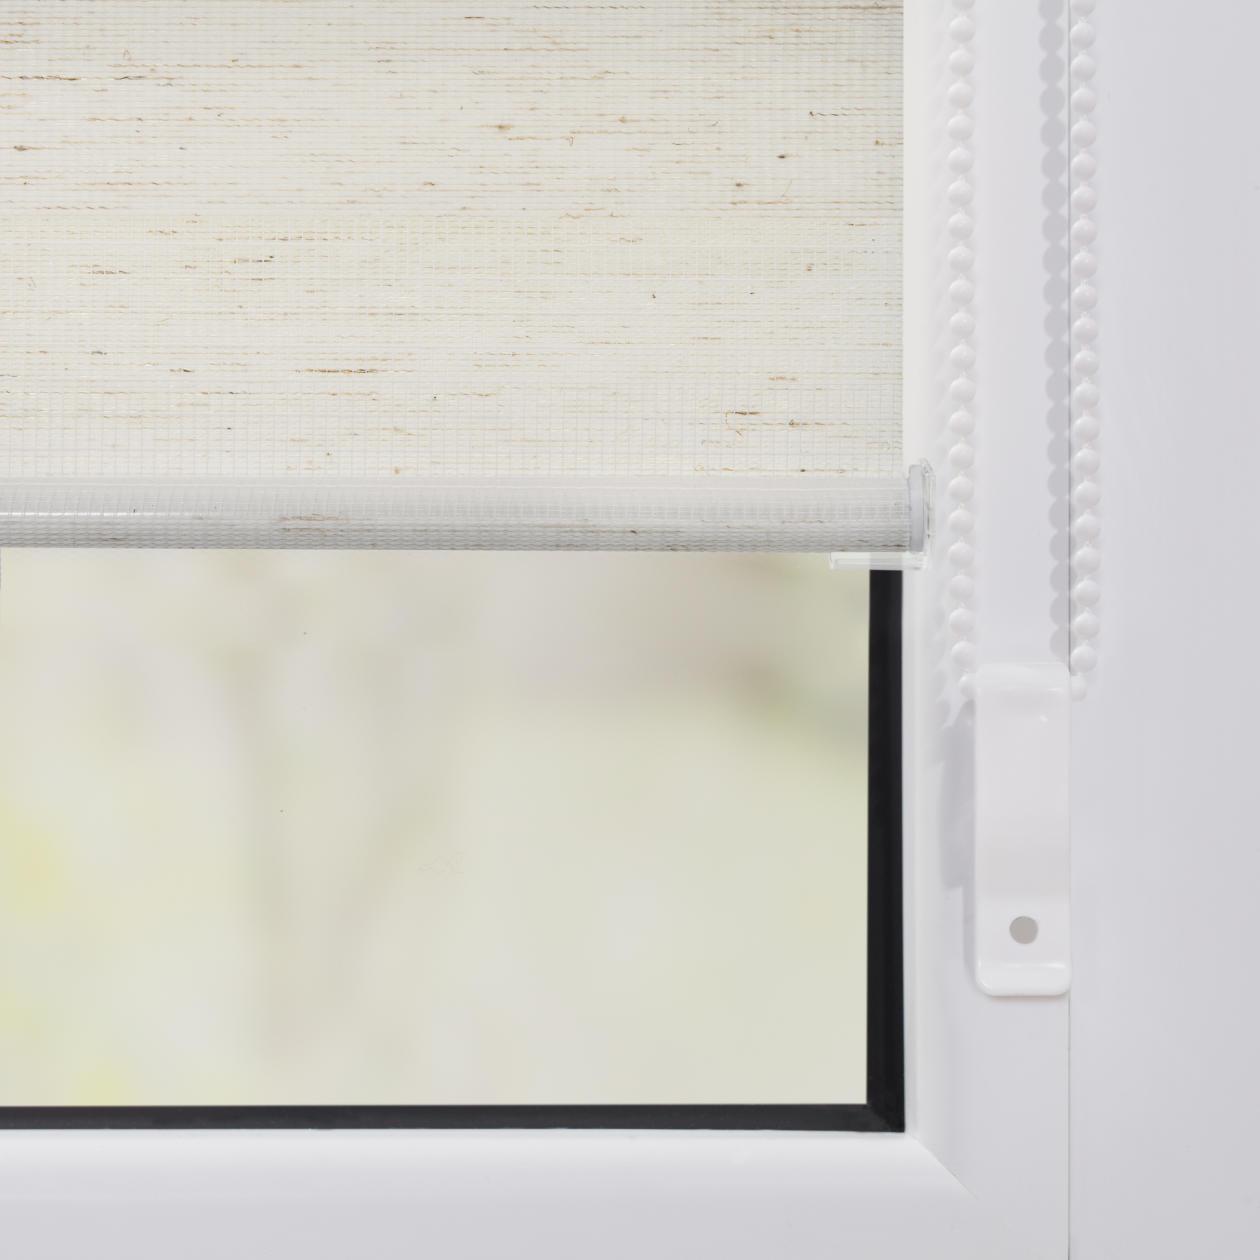 doppelrollo 65 cm breit interesting produktbild with doppelrollo 65 cm breit best doppelrollo. Black Bedroom Furniture Sets. Home Design Ideas